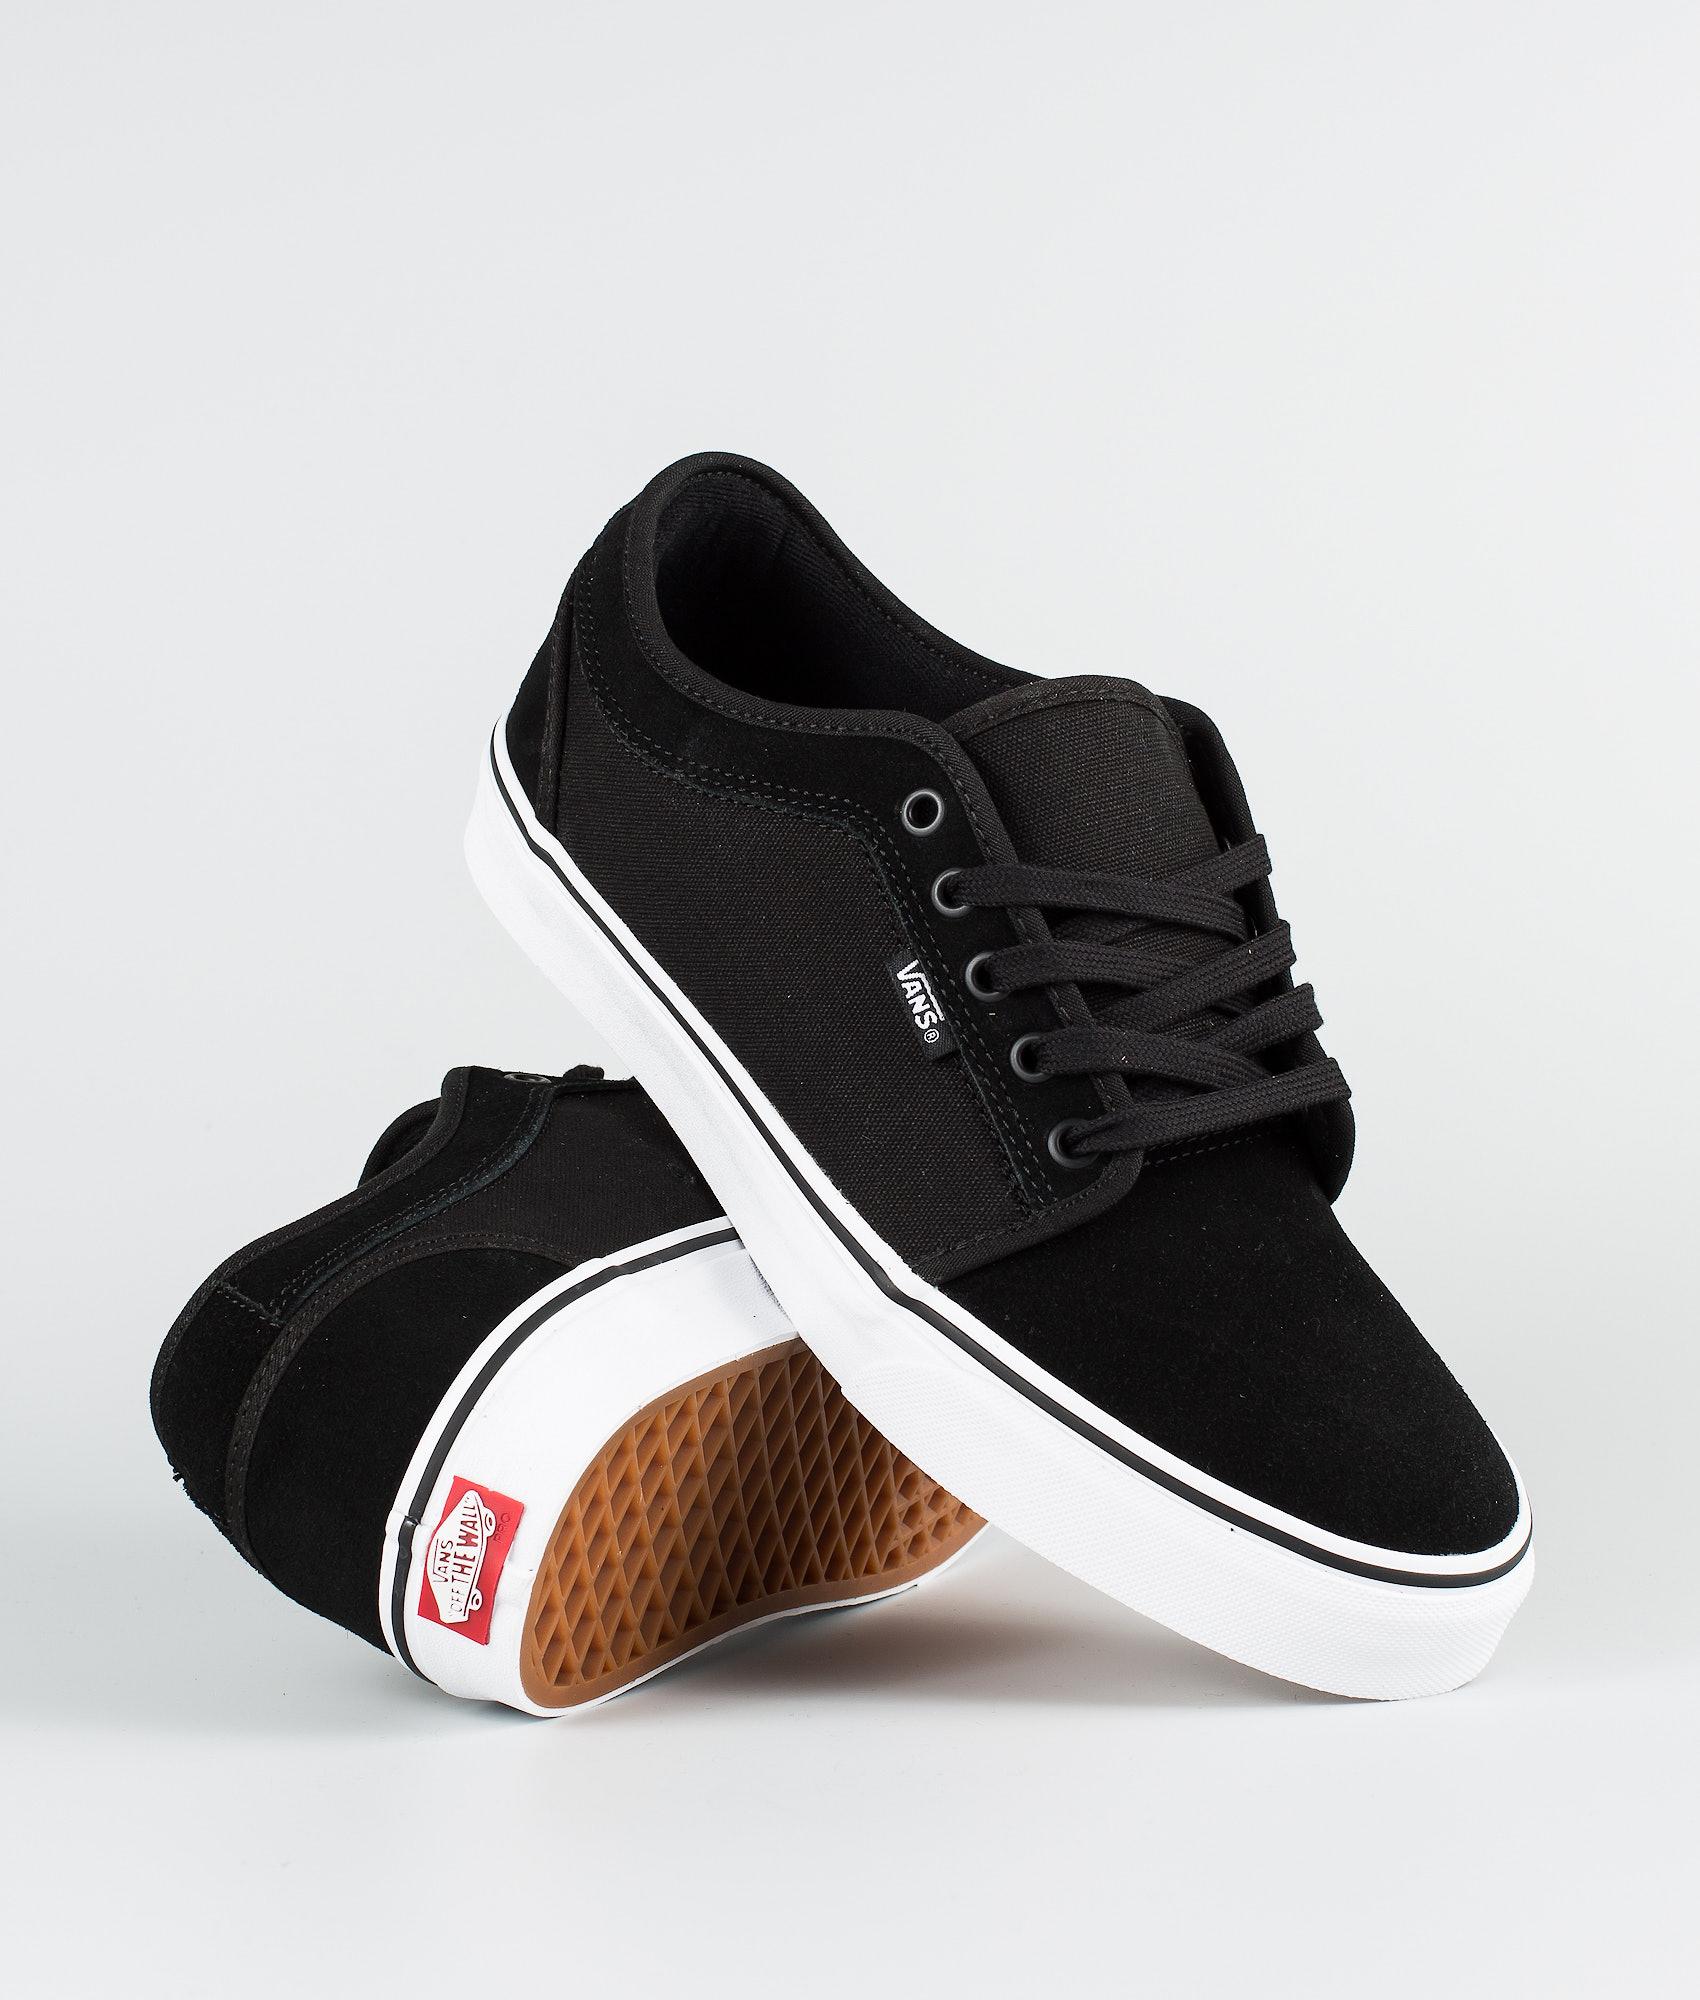 44bfb30ea7f17 Vans Chukka Low Shoes (Suede) Black/True White